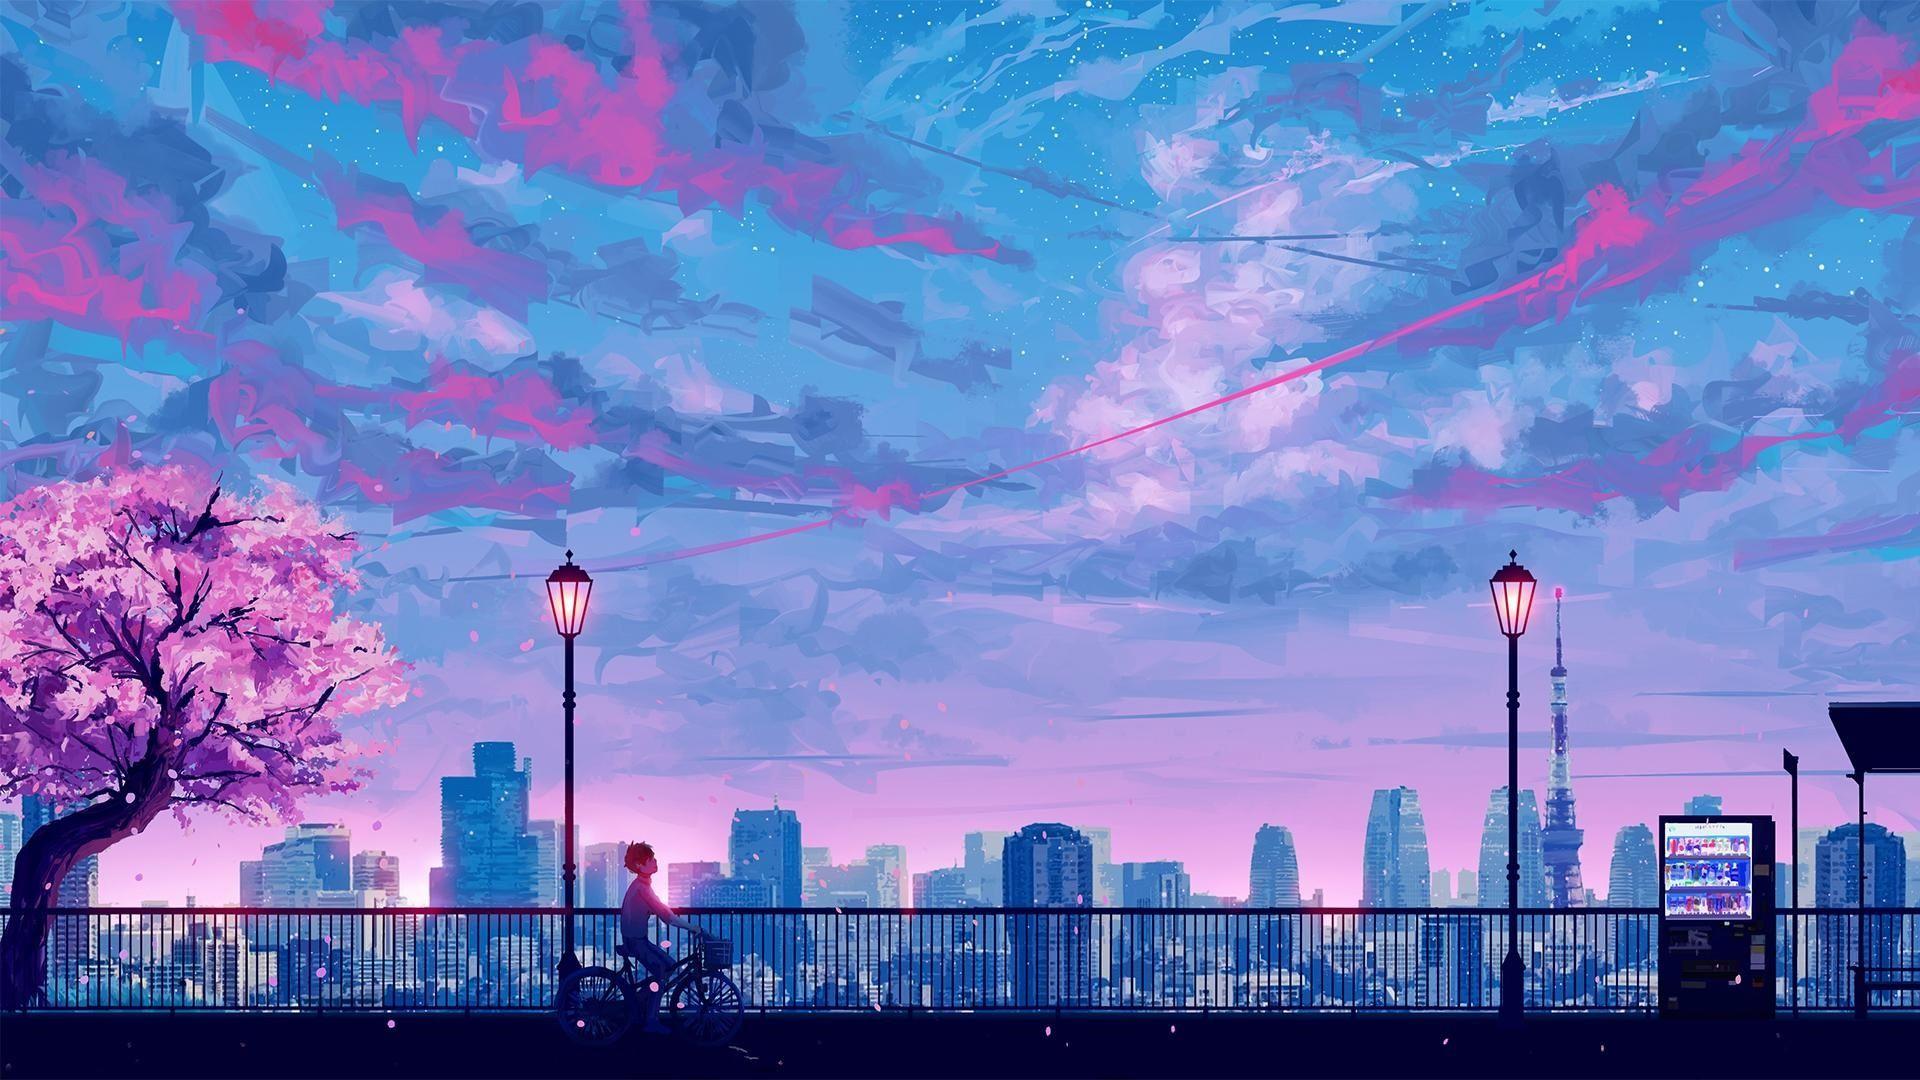 Anime City Wallpapers on WallpaperDog